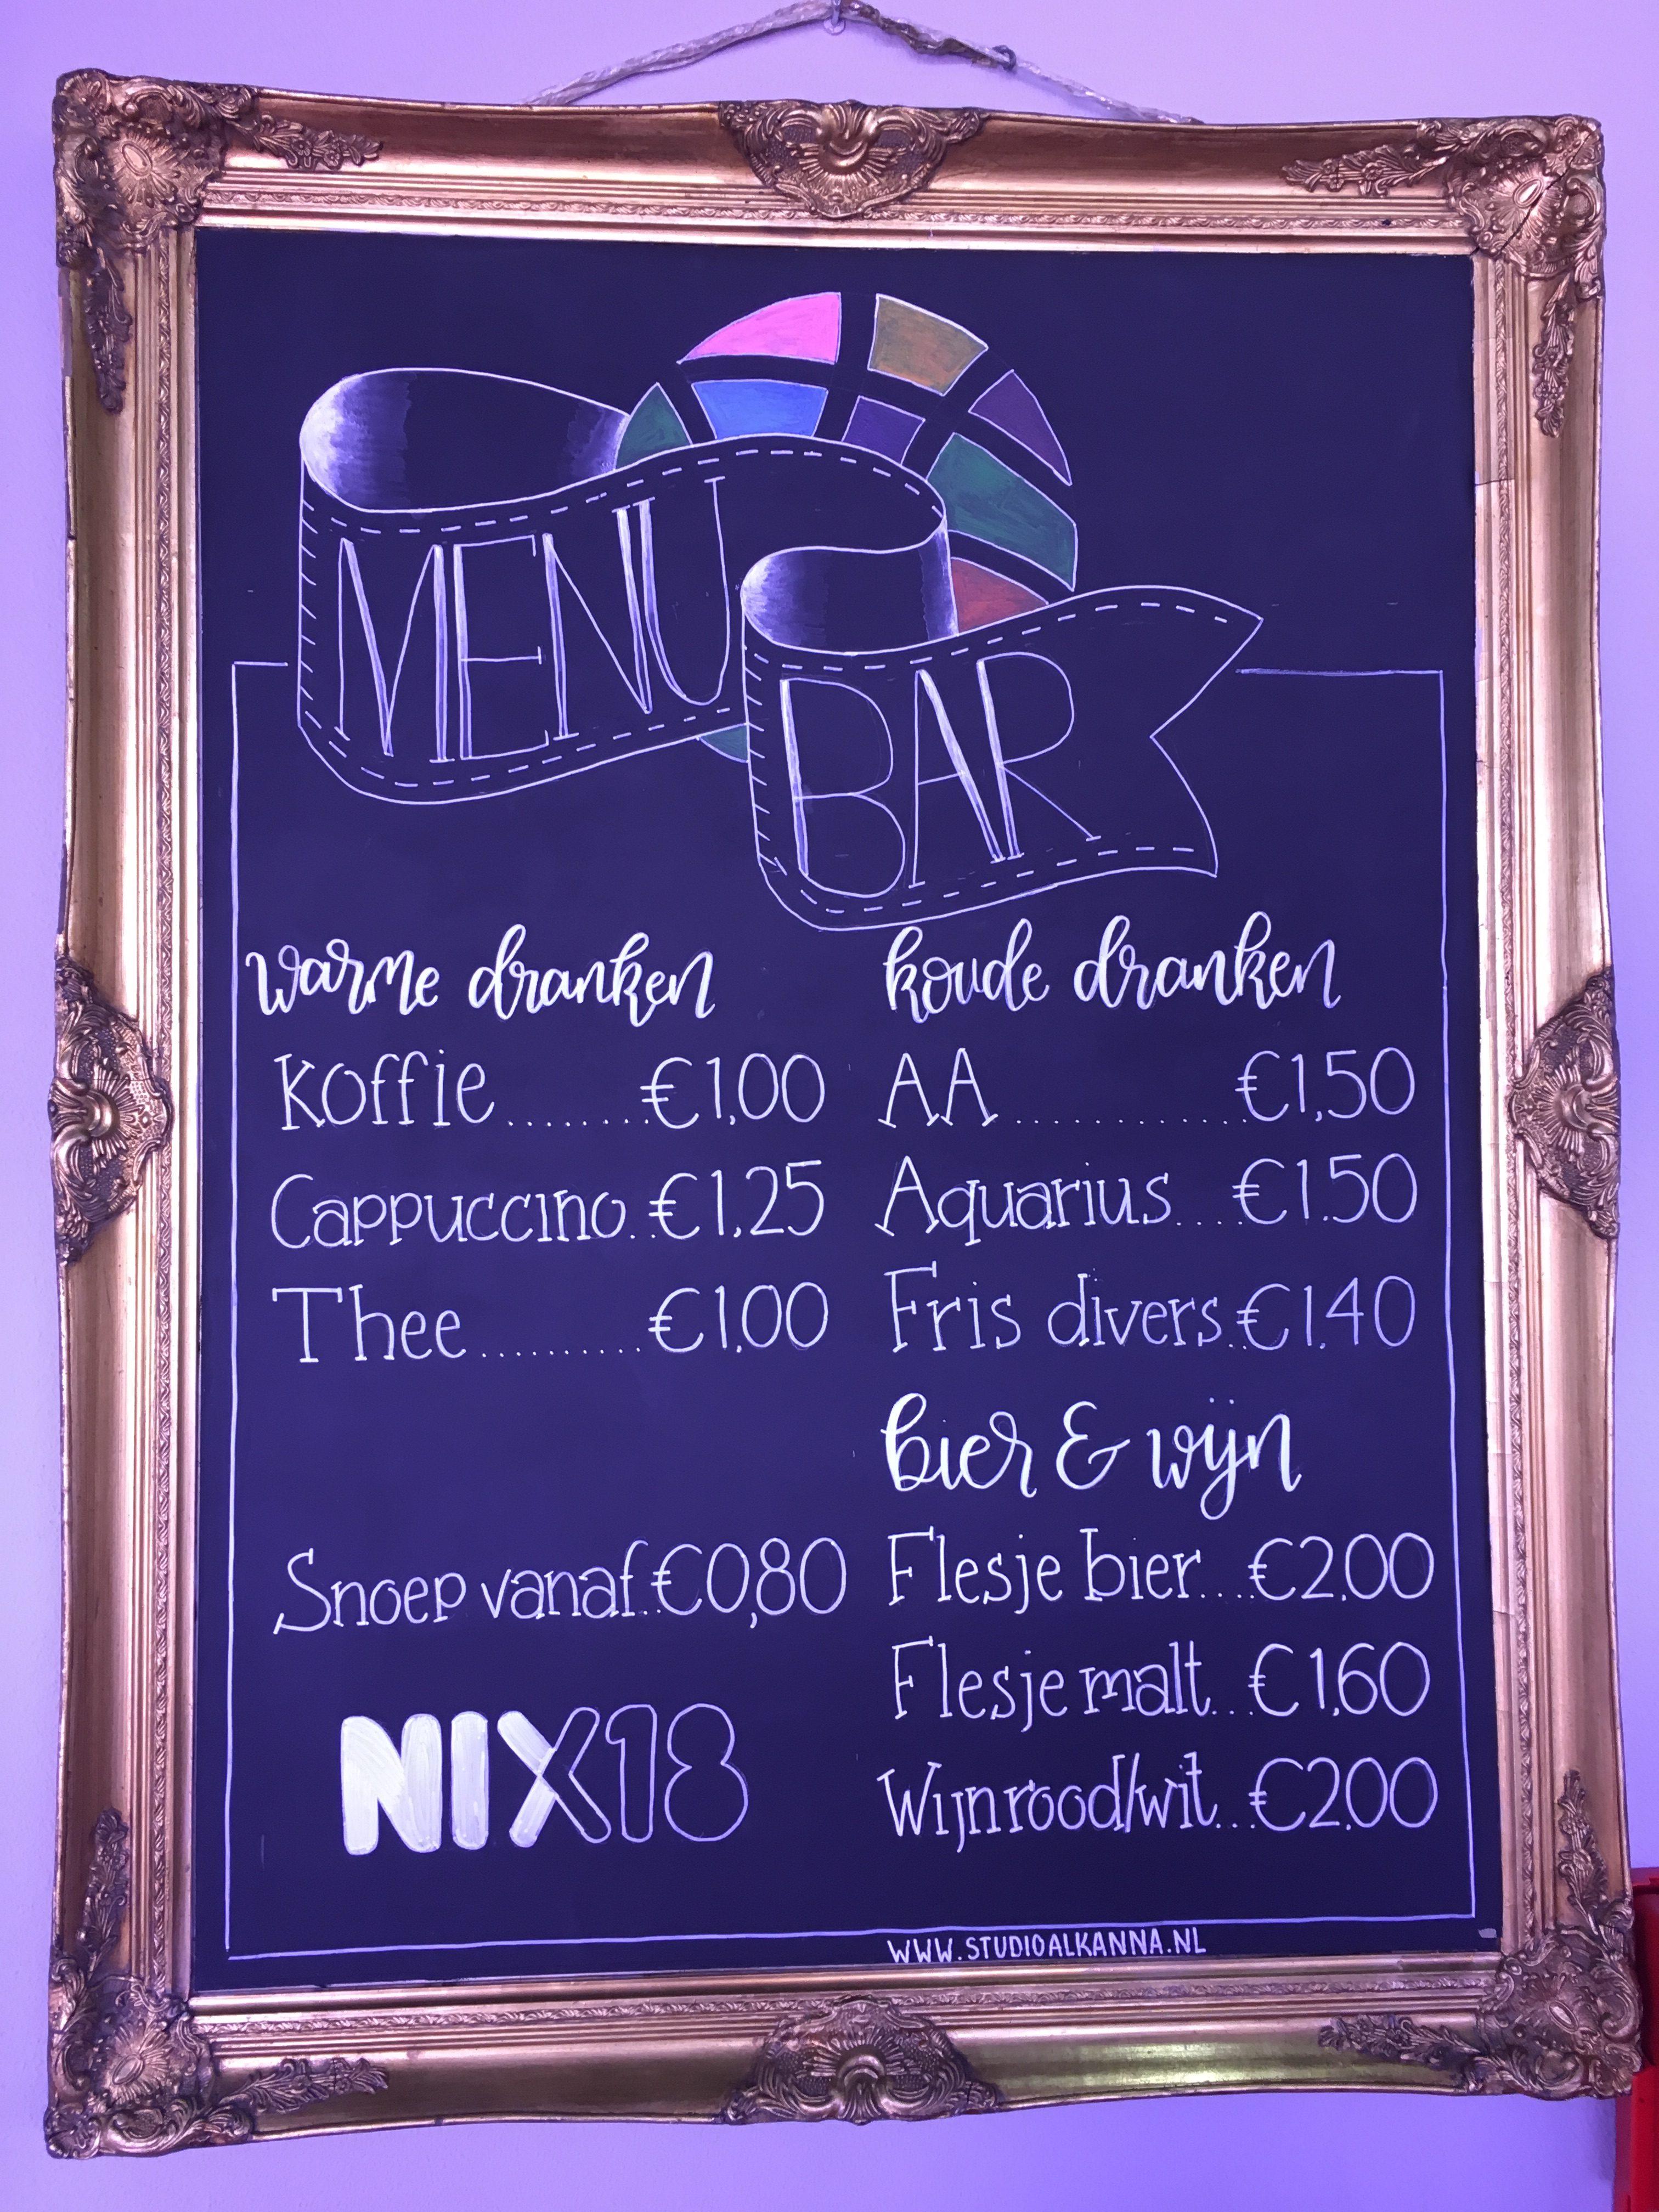 Horeca krijtbord met kleur en NIX18 logo